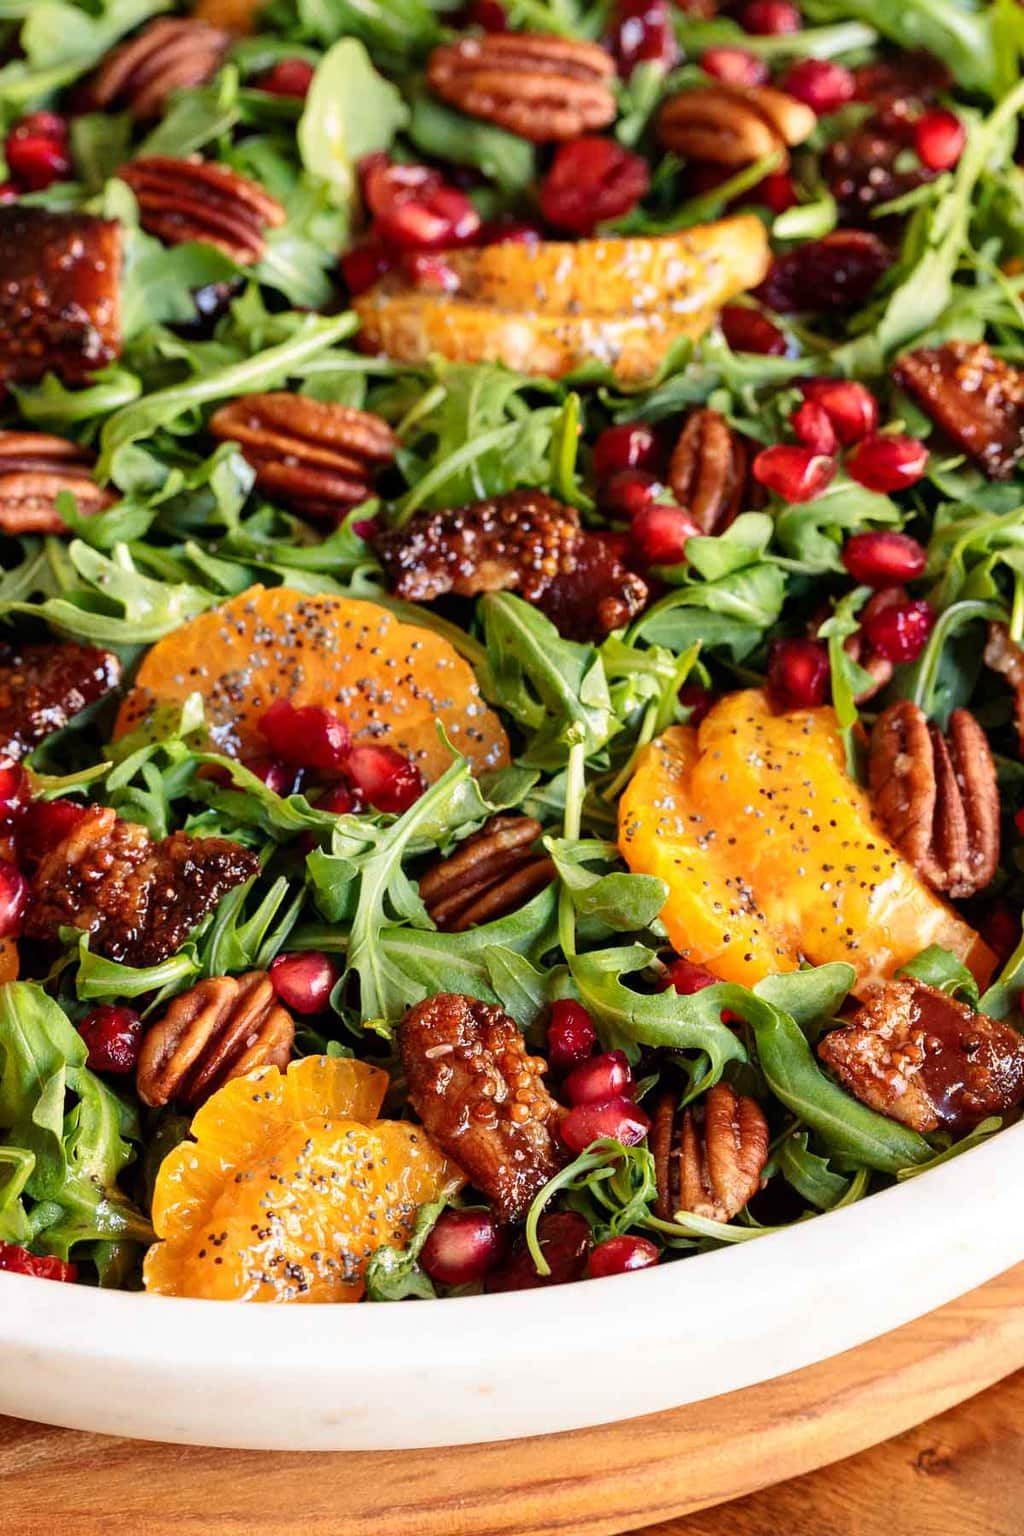 Extreme closeup photo of a Cranberry Clementine Arugula Salad.